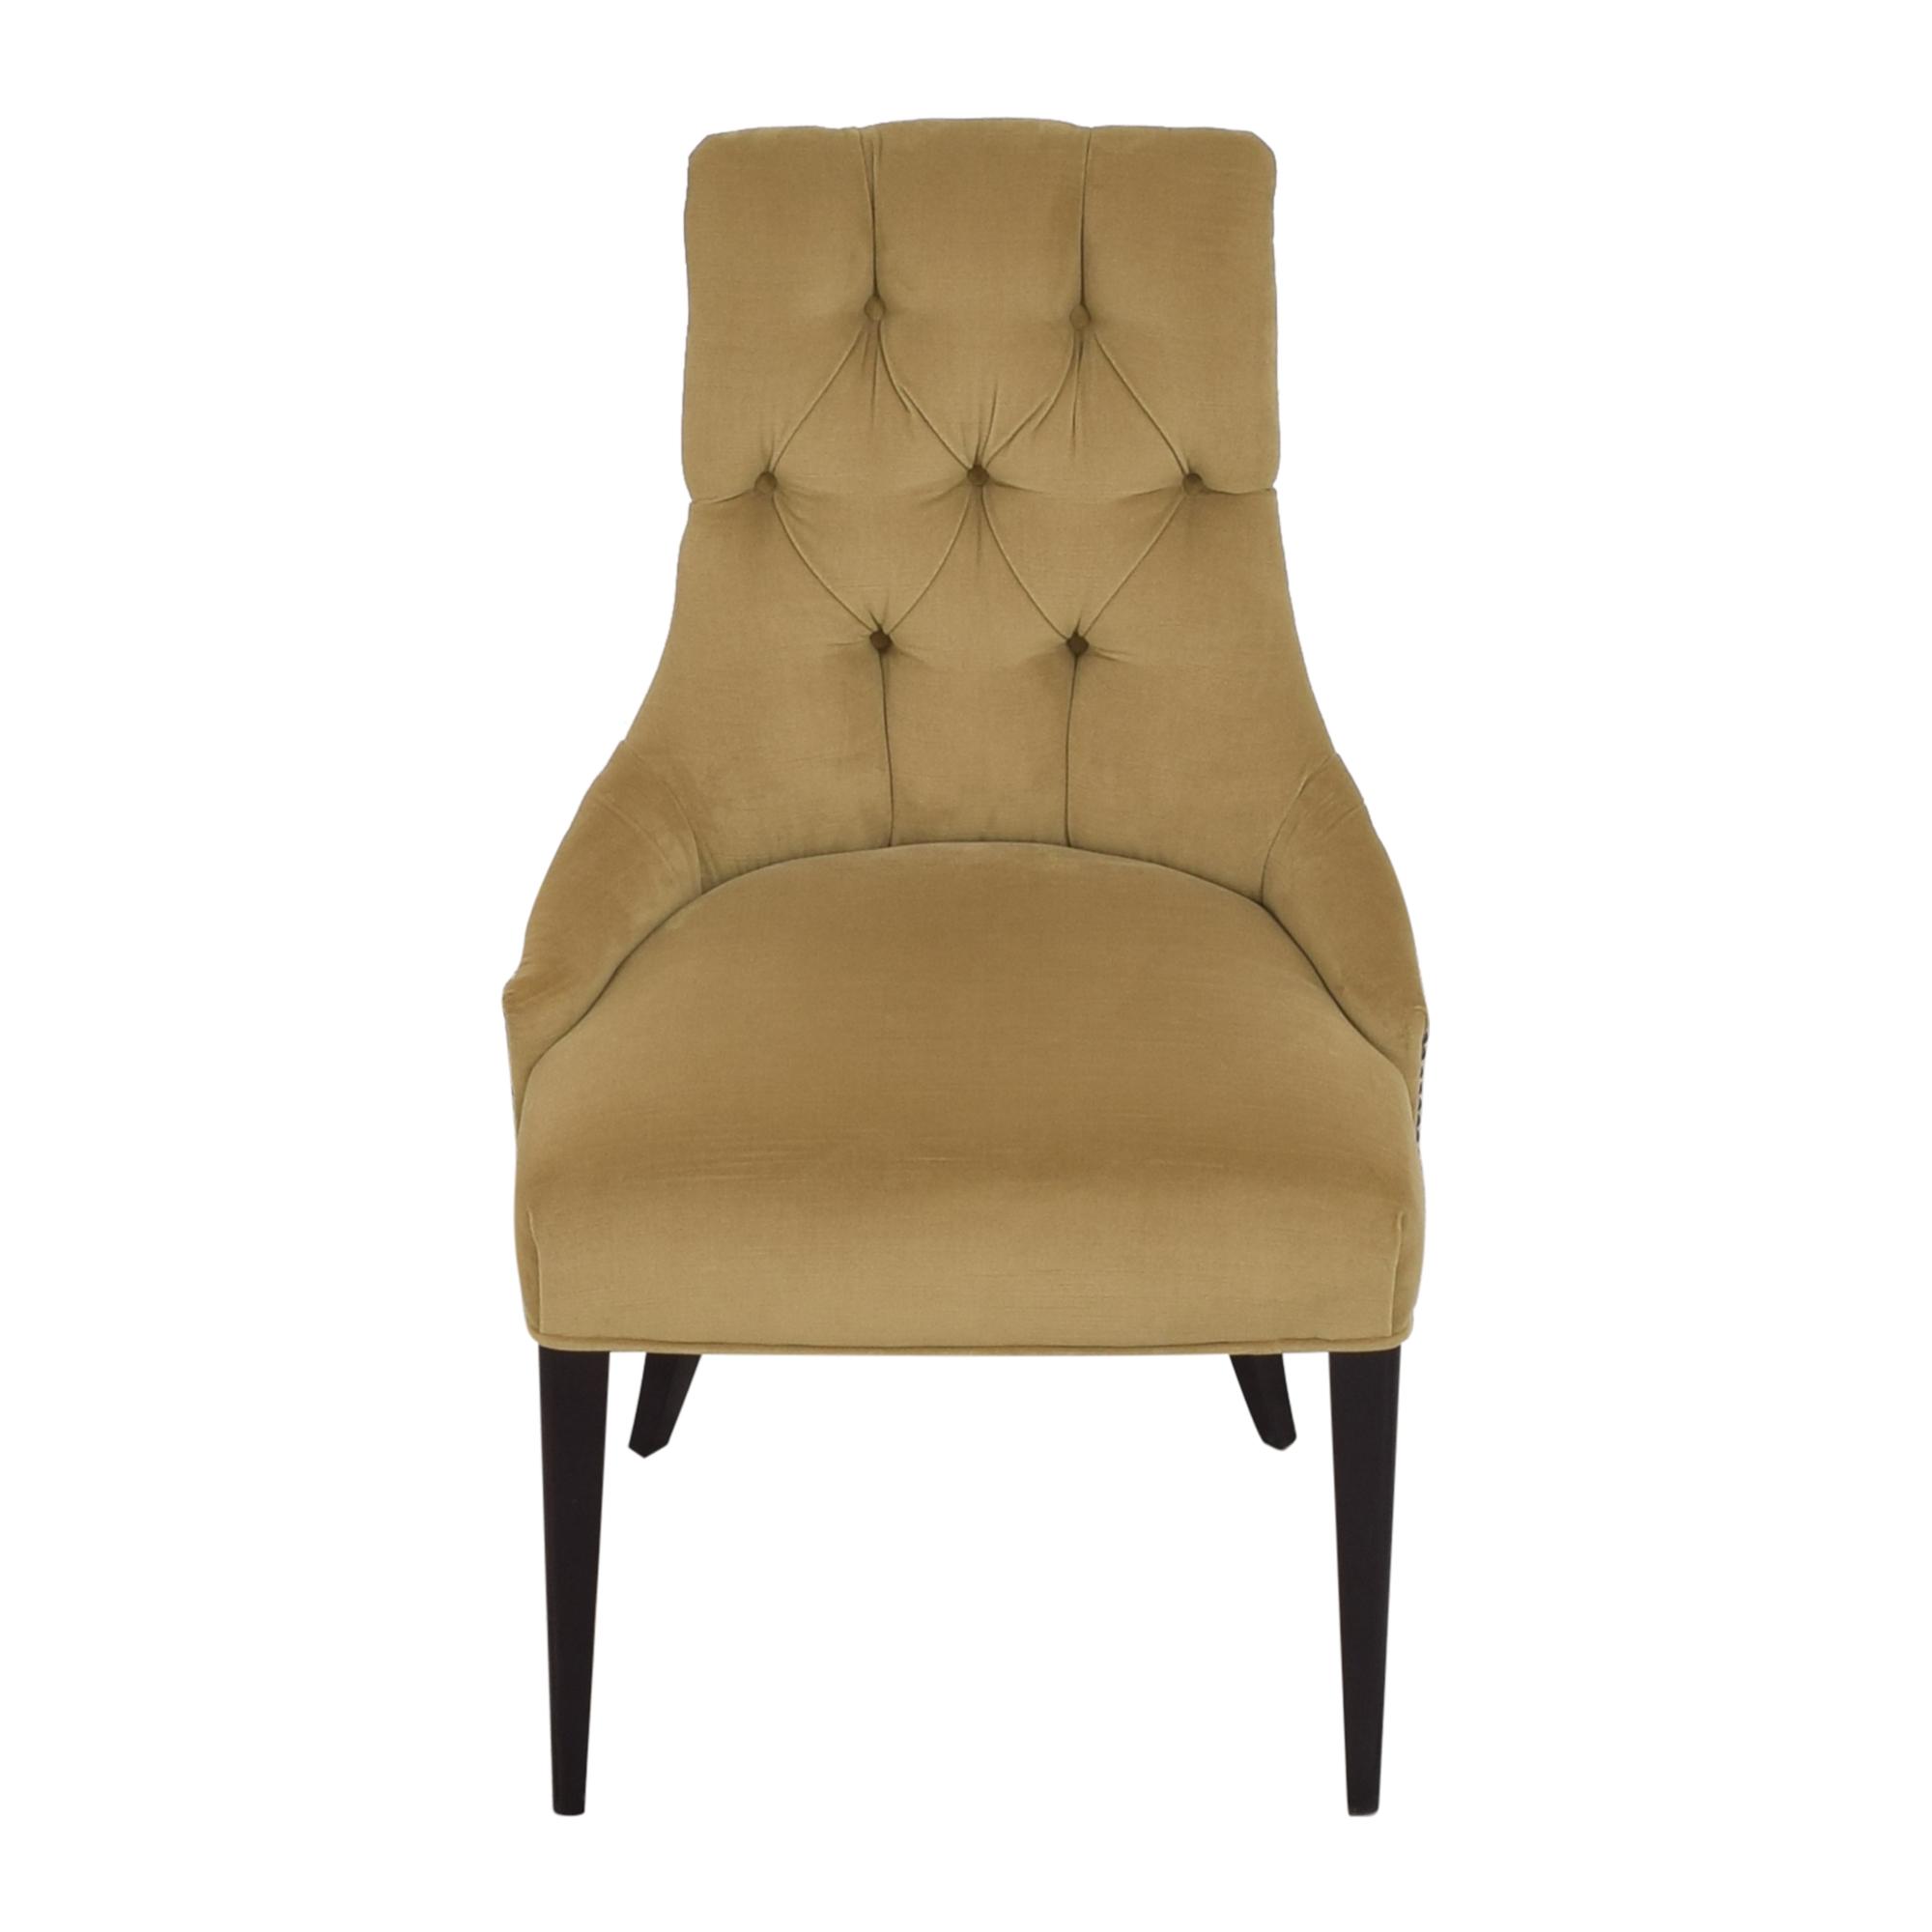 Baker Furniture Ritz Chair by Thomas Pheasant / Chairs